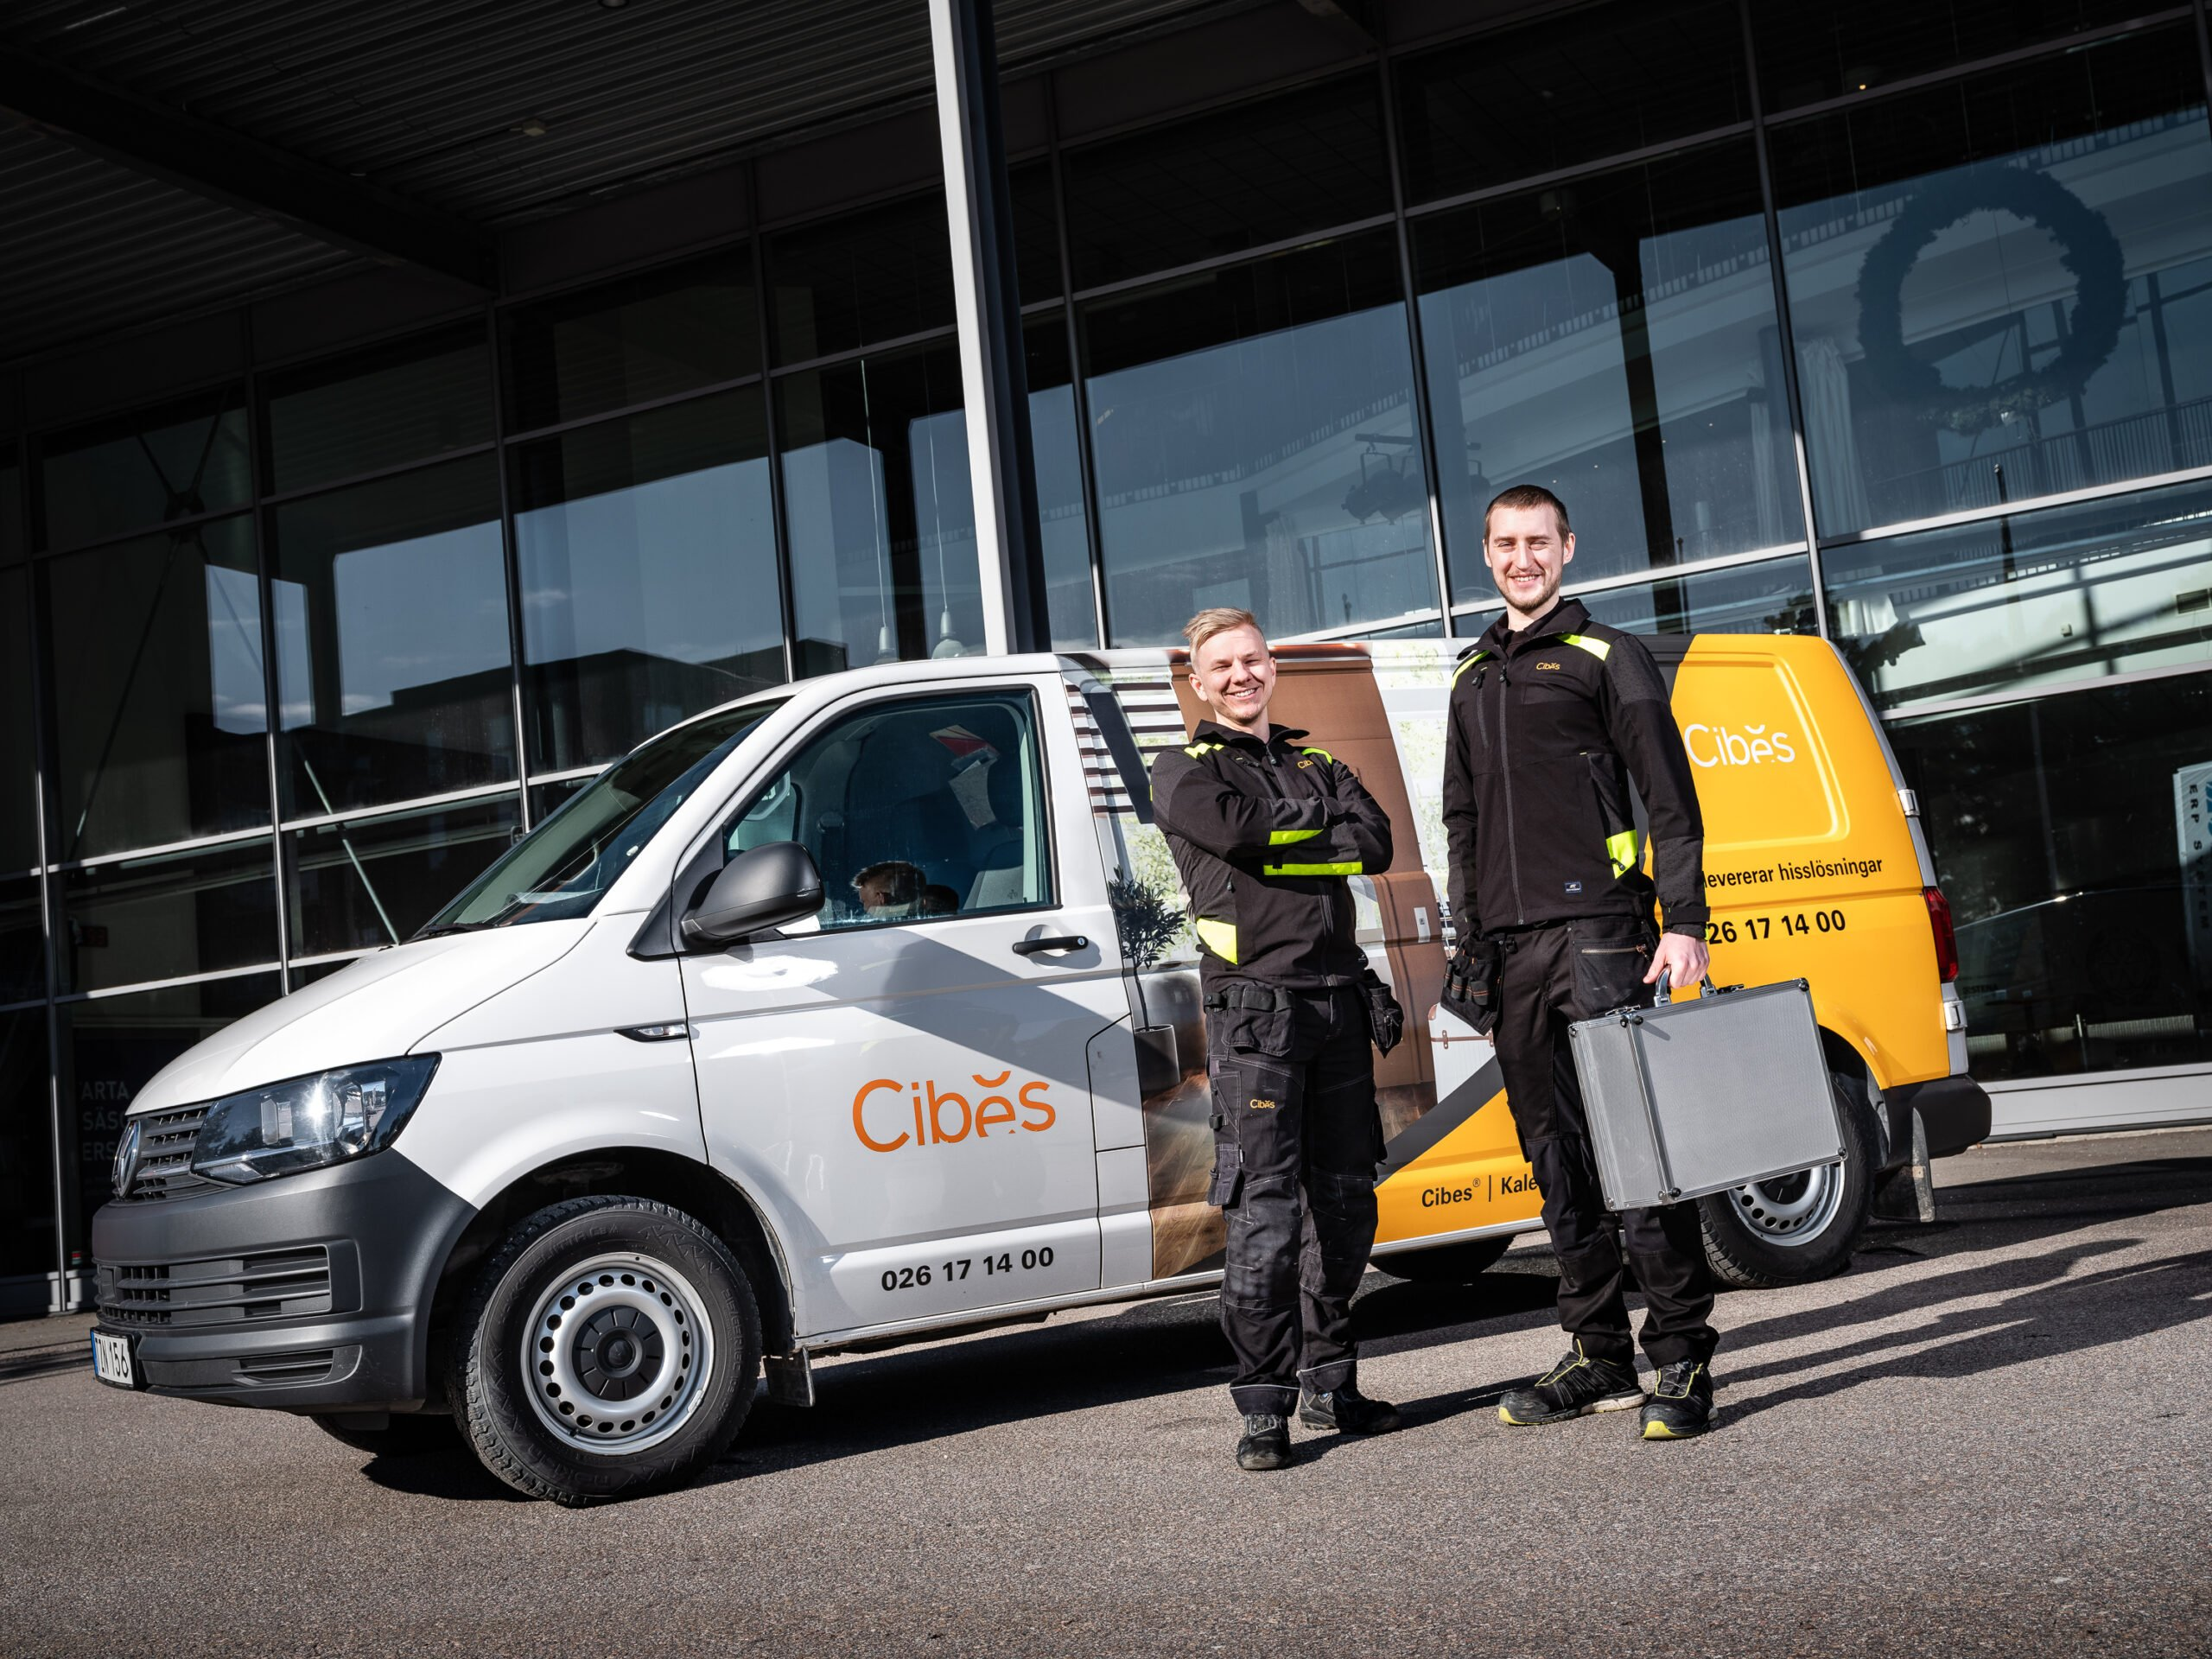 Cibes Lift UK Recruiting Service and maintenance engineer